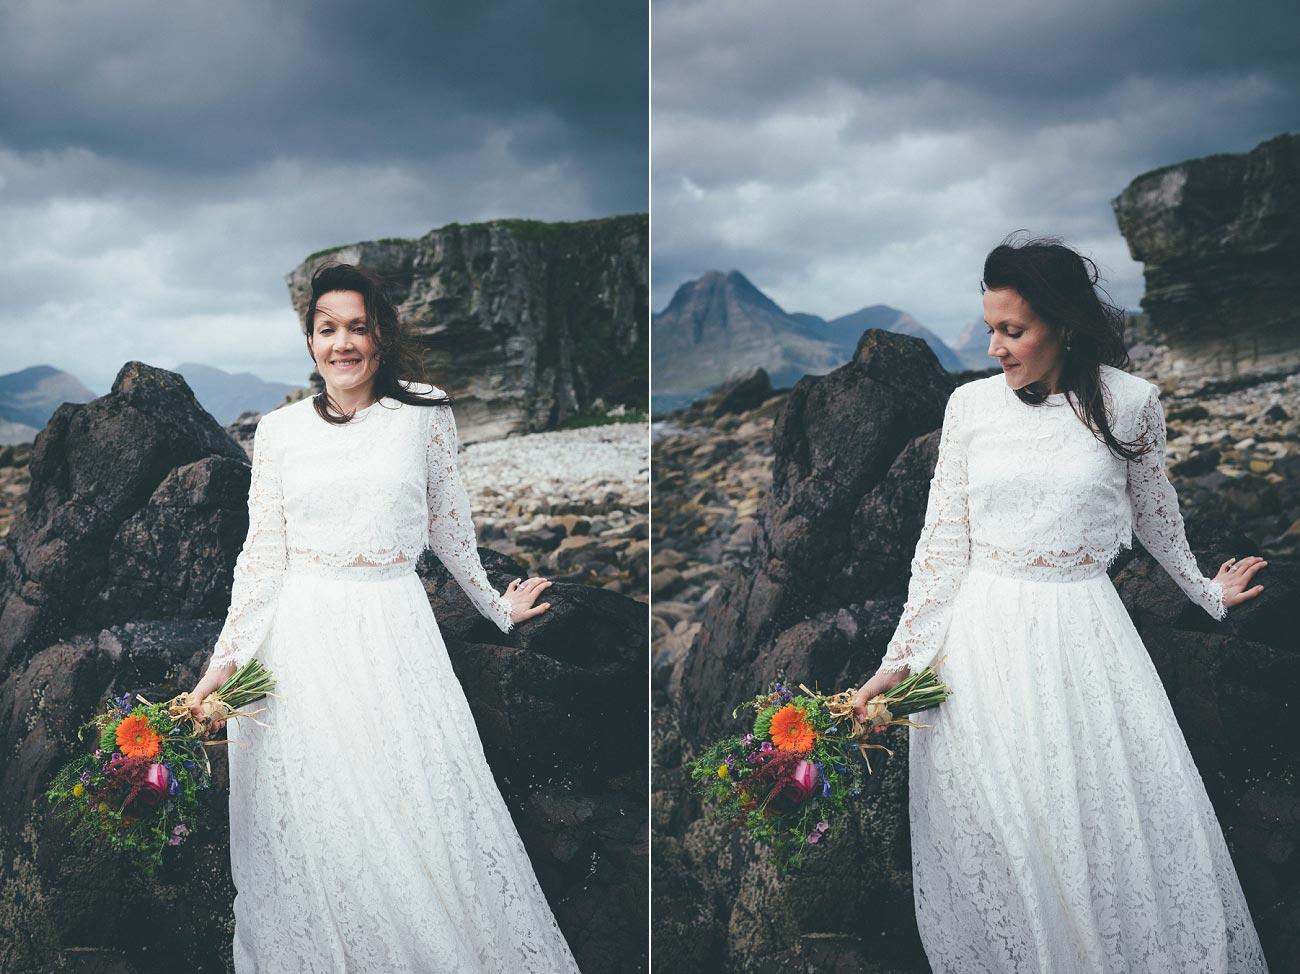 isle of skye wedding photography elopement loch coruisk humanist outdoor weddings scottish highlands 0070